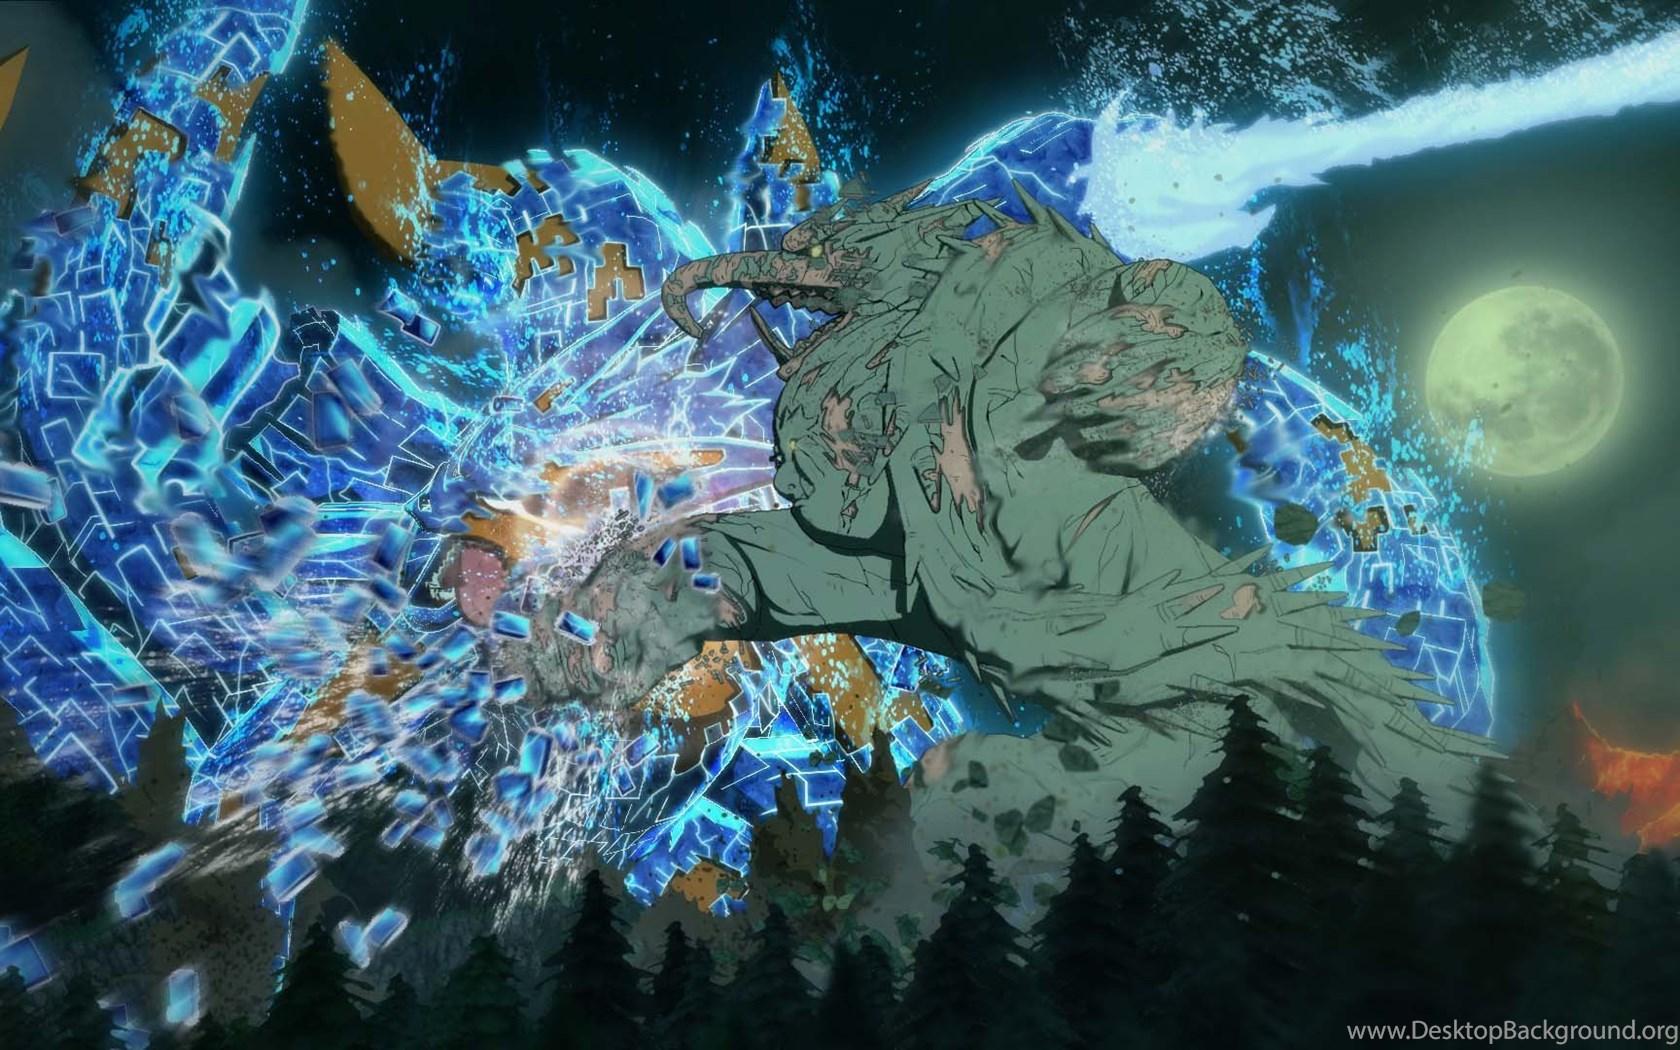 Naruto Shippuden Ultimate Ninja Storm 4 Cool Wallpapers Hd For